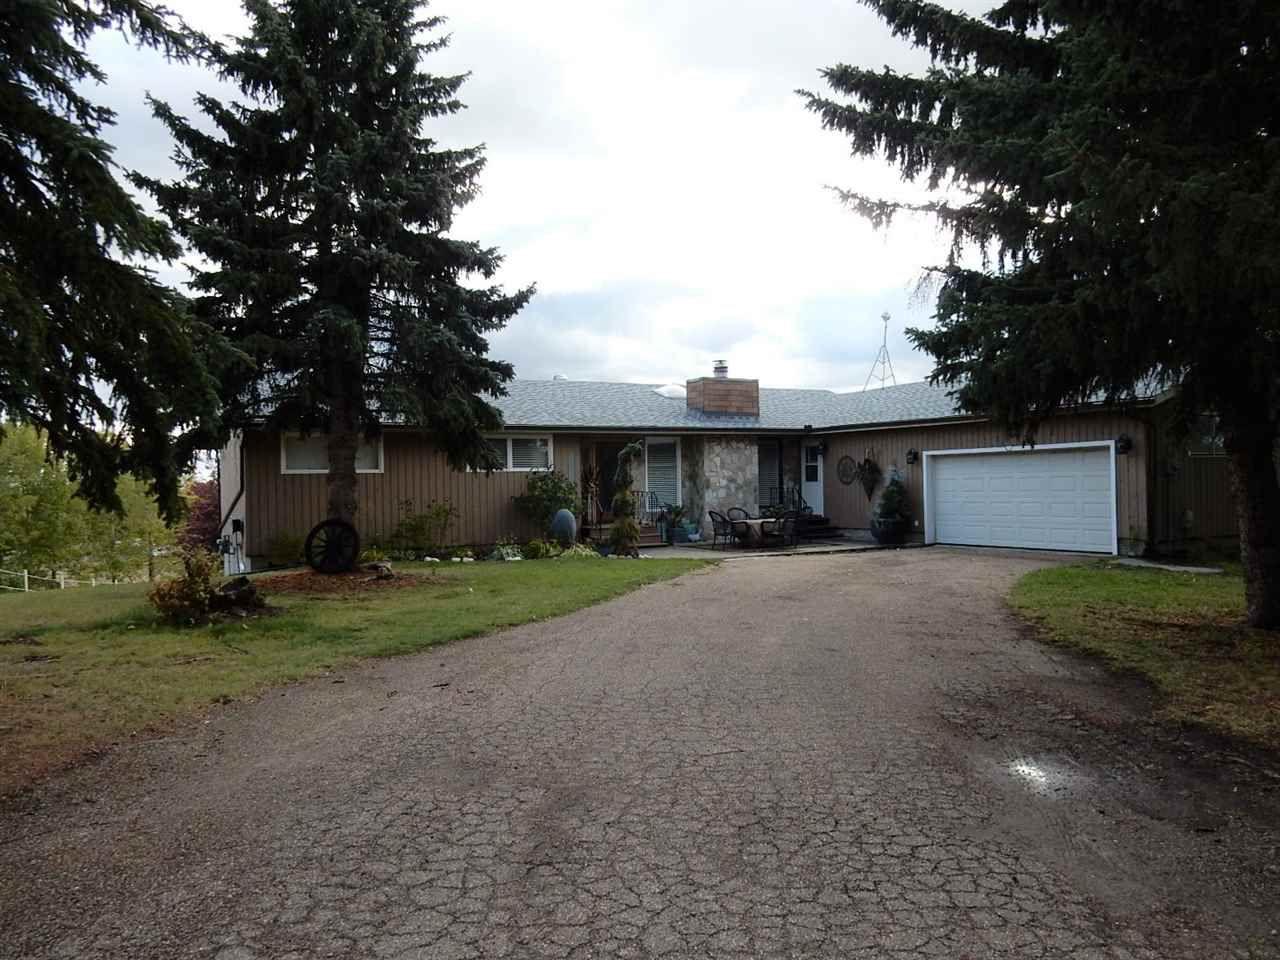 Main Photo: 182 52063 Range Road 225: Rural Strathcona County House for sale : MLS®# E4148735